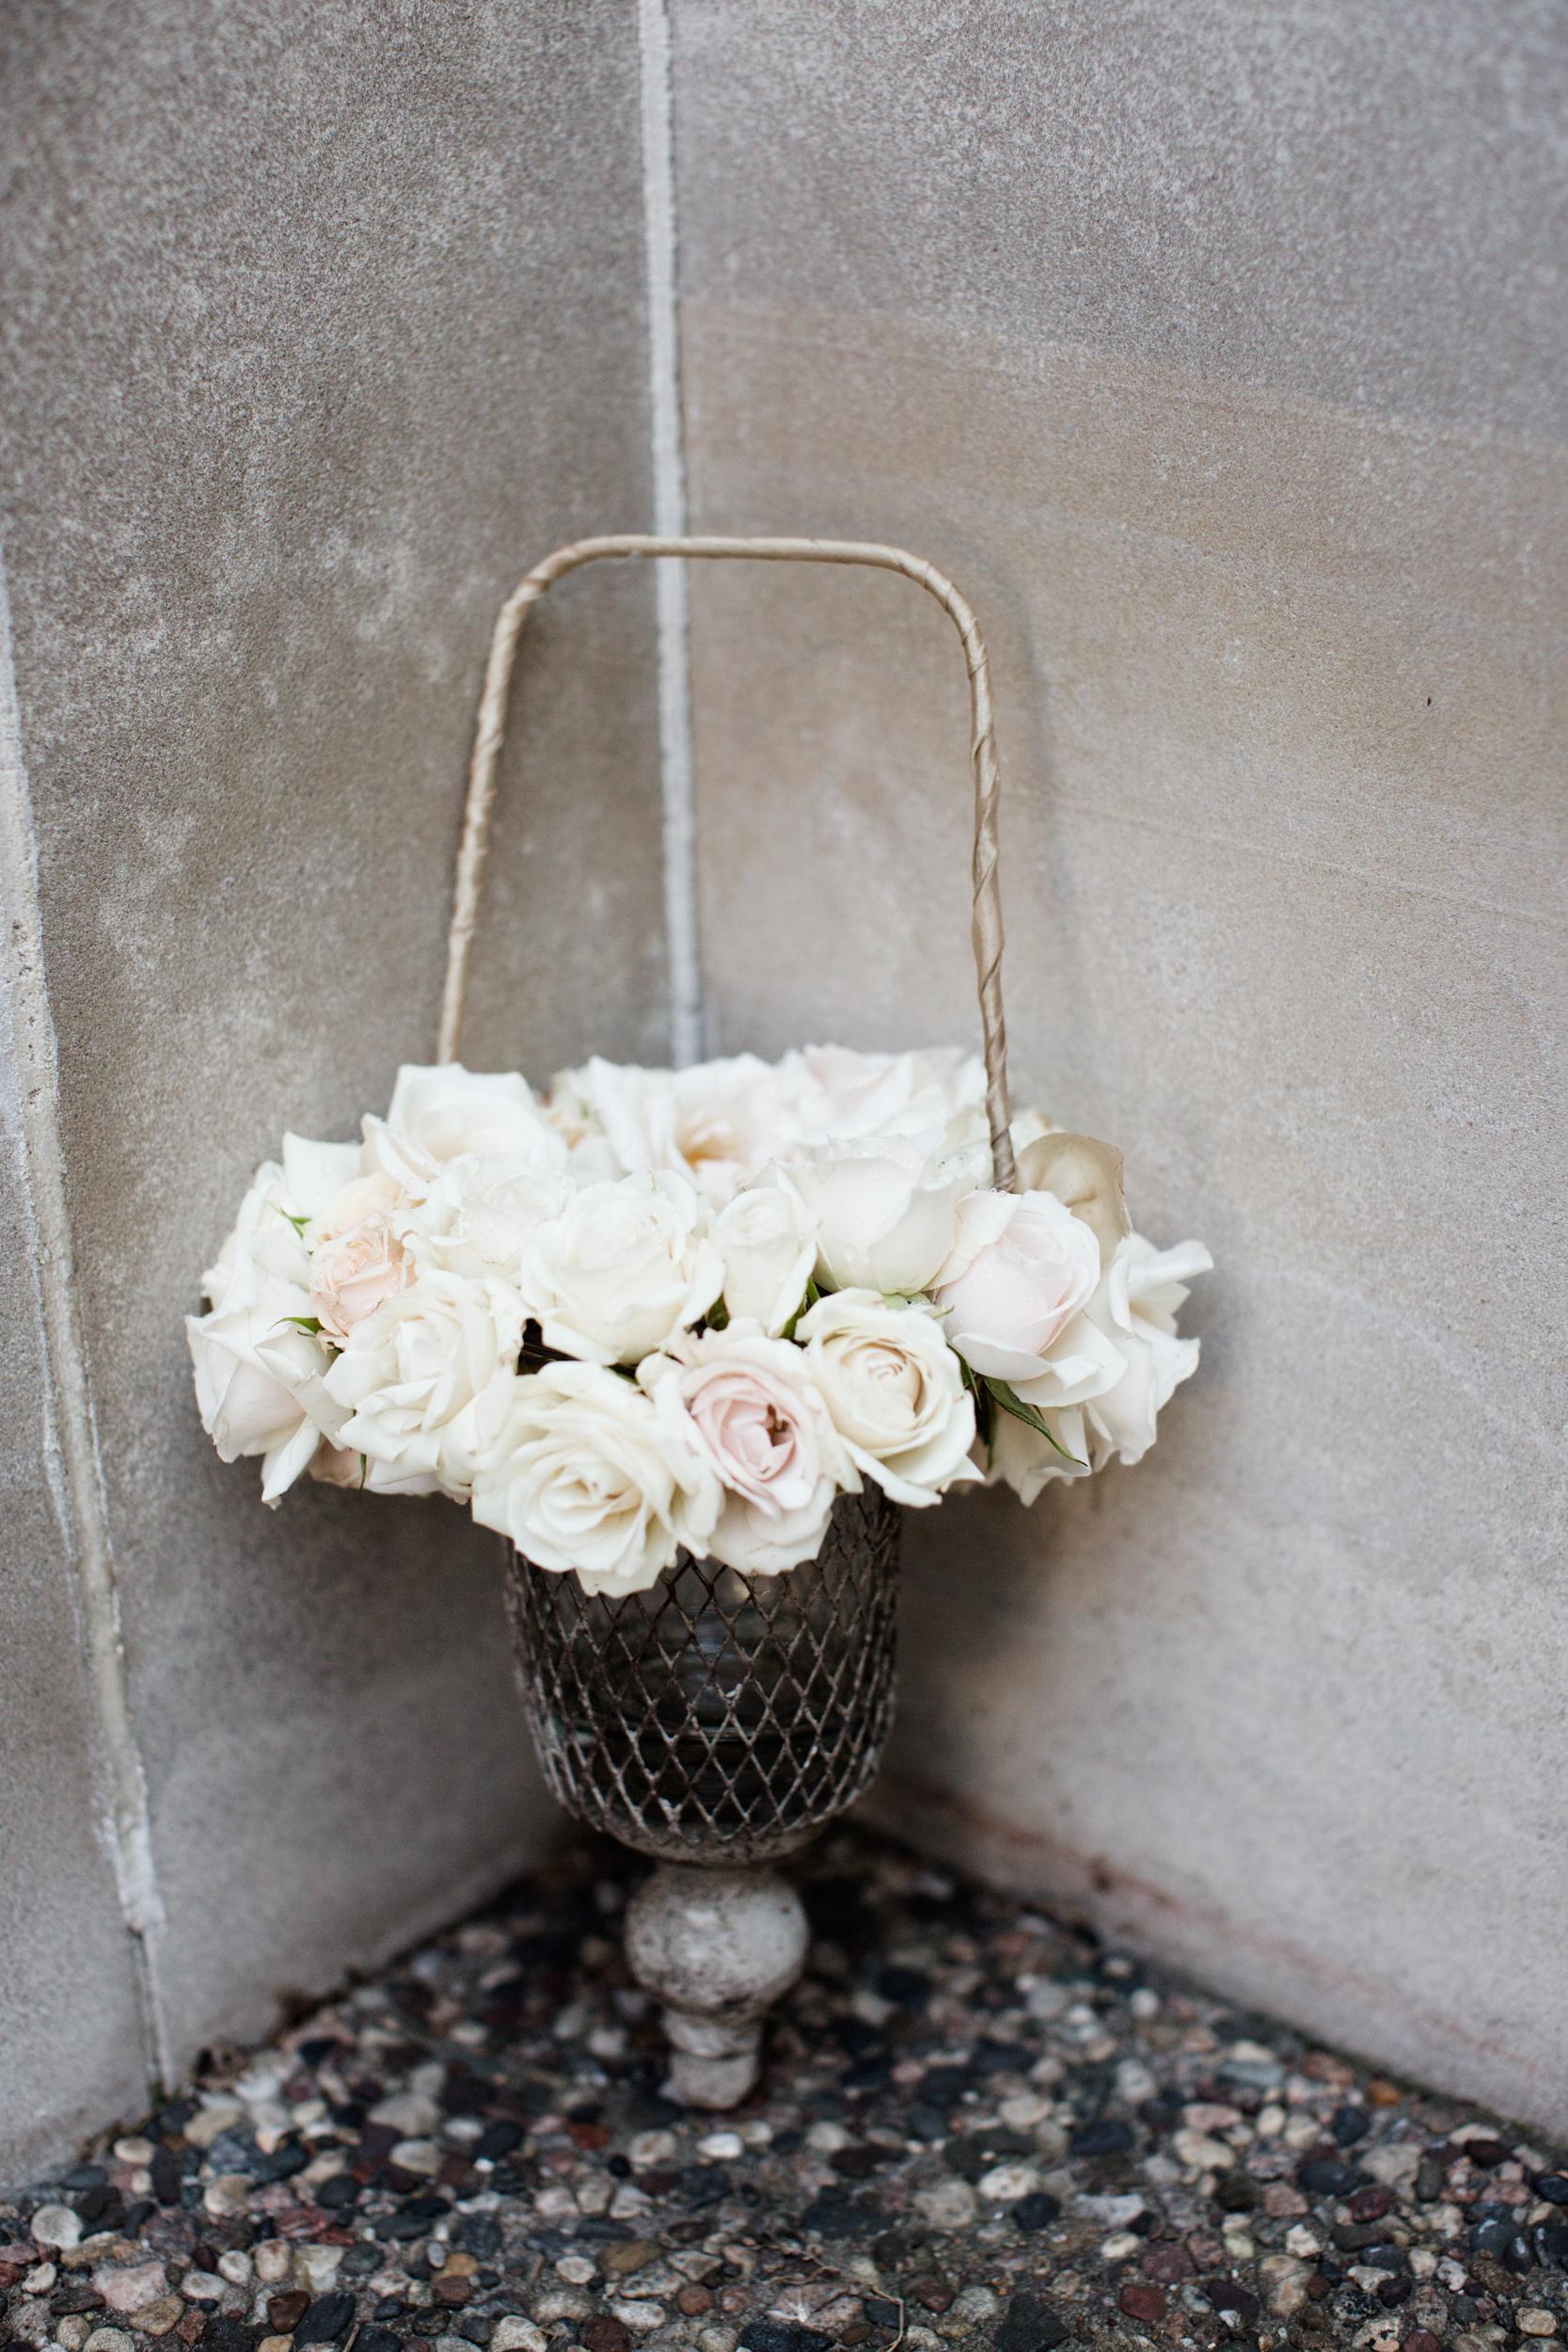 Ceci_New_York_Ceci_Style_Ceci_Johnson_Luxury_Lifestyle_Floral_Lace_Wedding_Letterpress_Inspiration_Design_Custom_Couture_Personalized_Invitations_-114.jpg